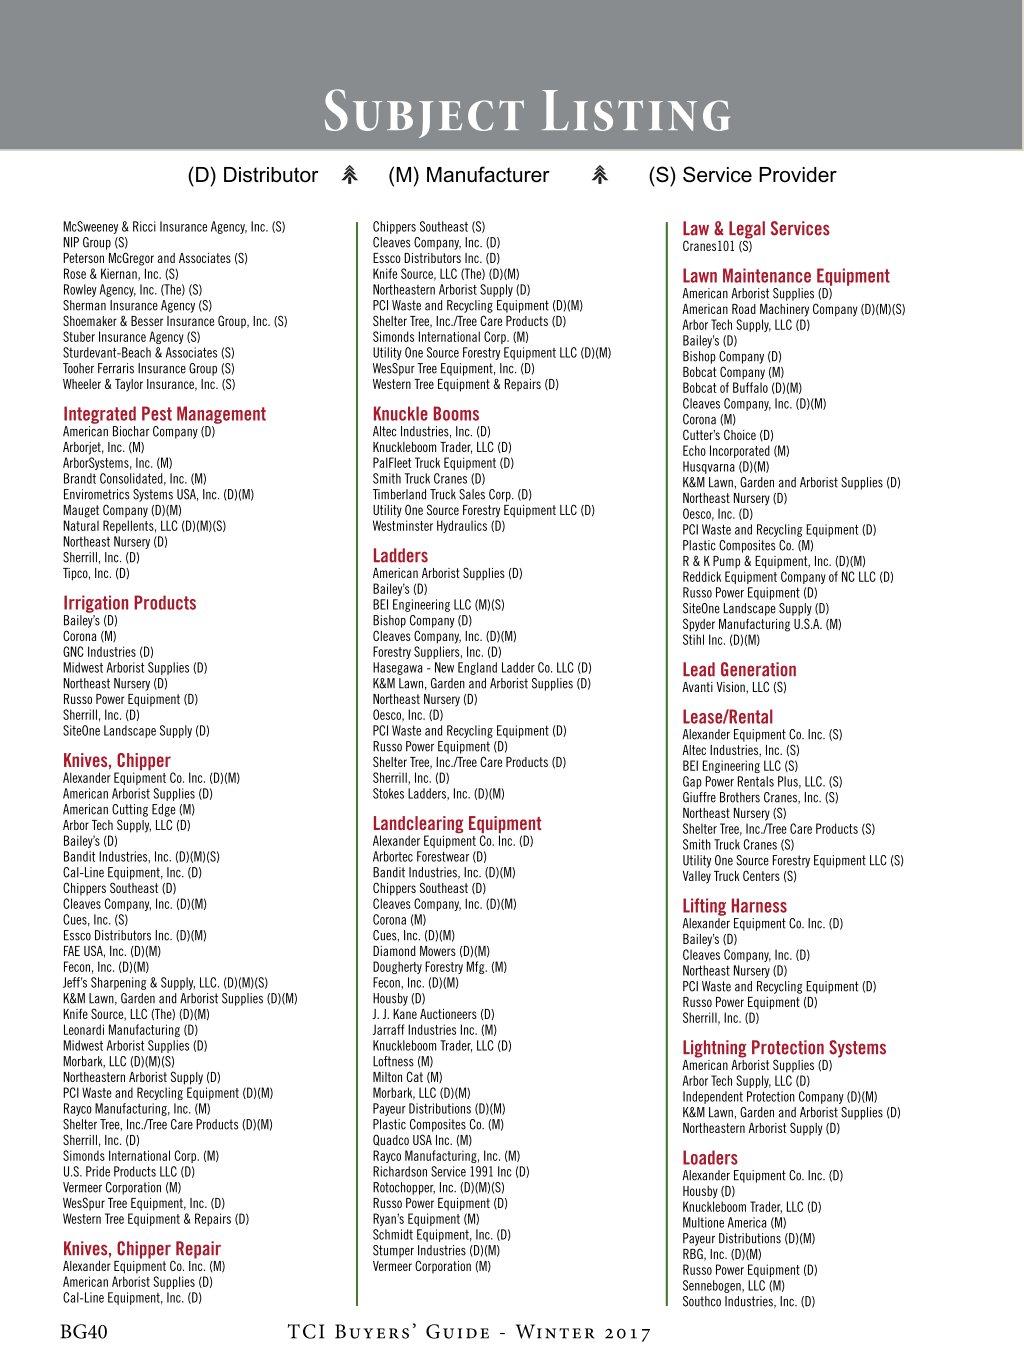 TCIA Buyers Guide Winter 2017 Digimag